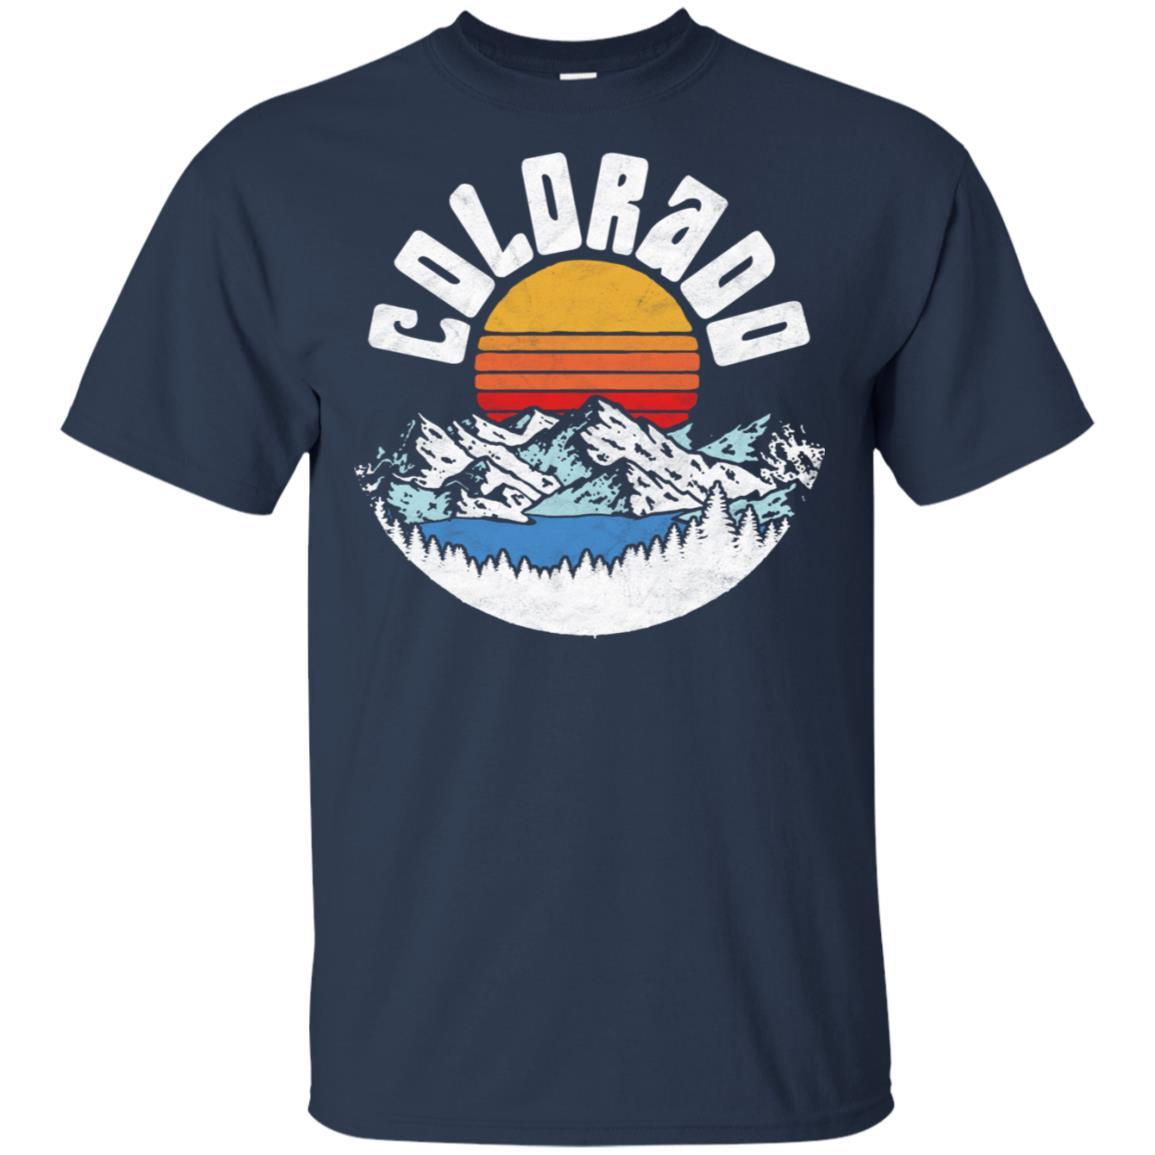 Retro Colorado Outdoors Lake & Mountains Graphic Unisex Short Sleeve